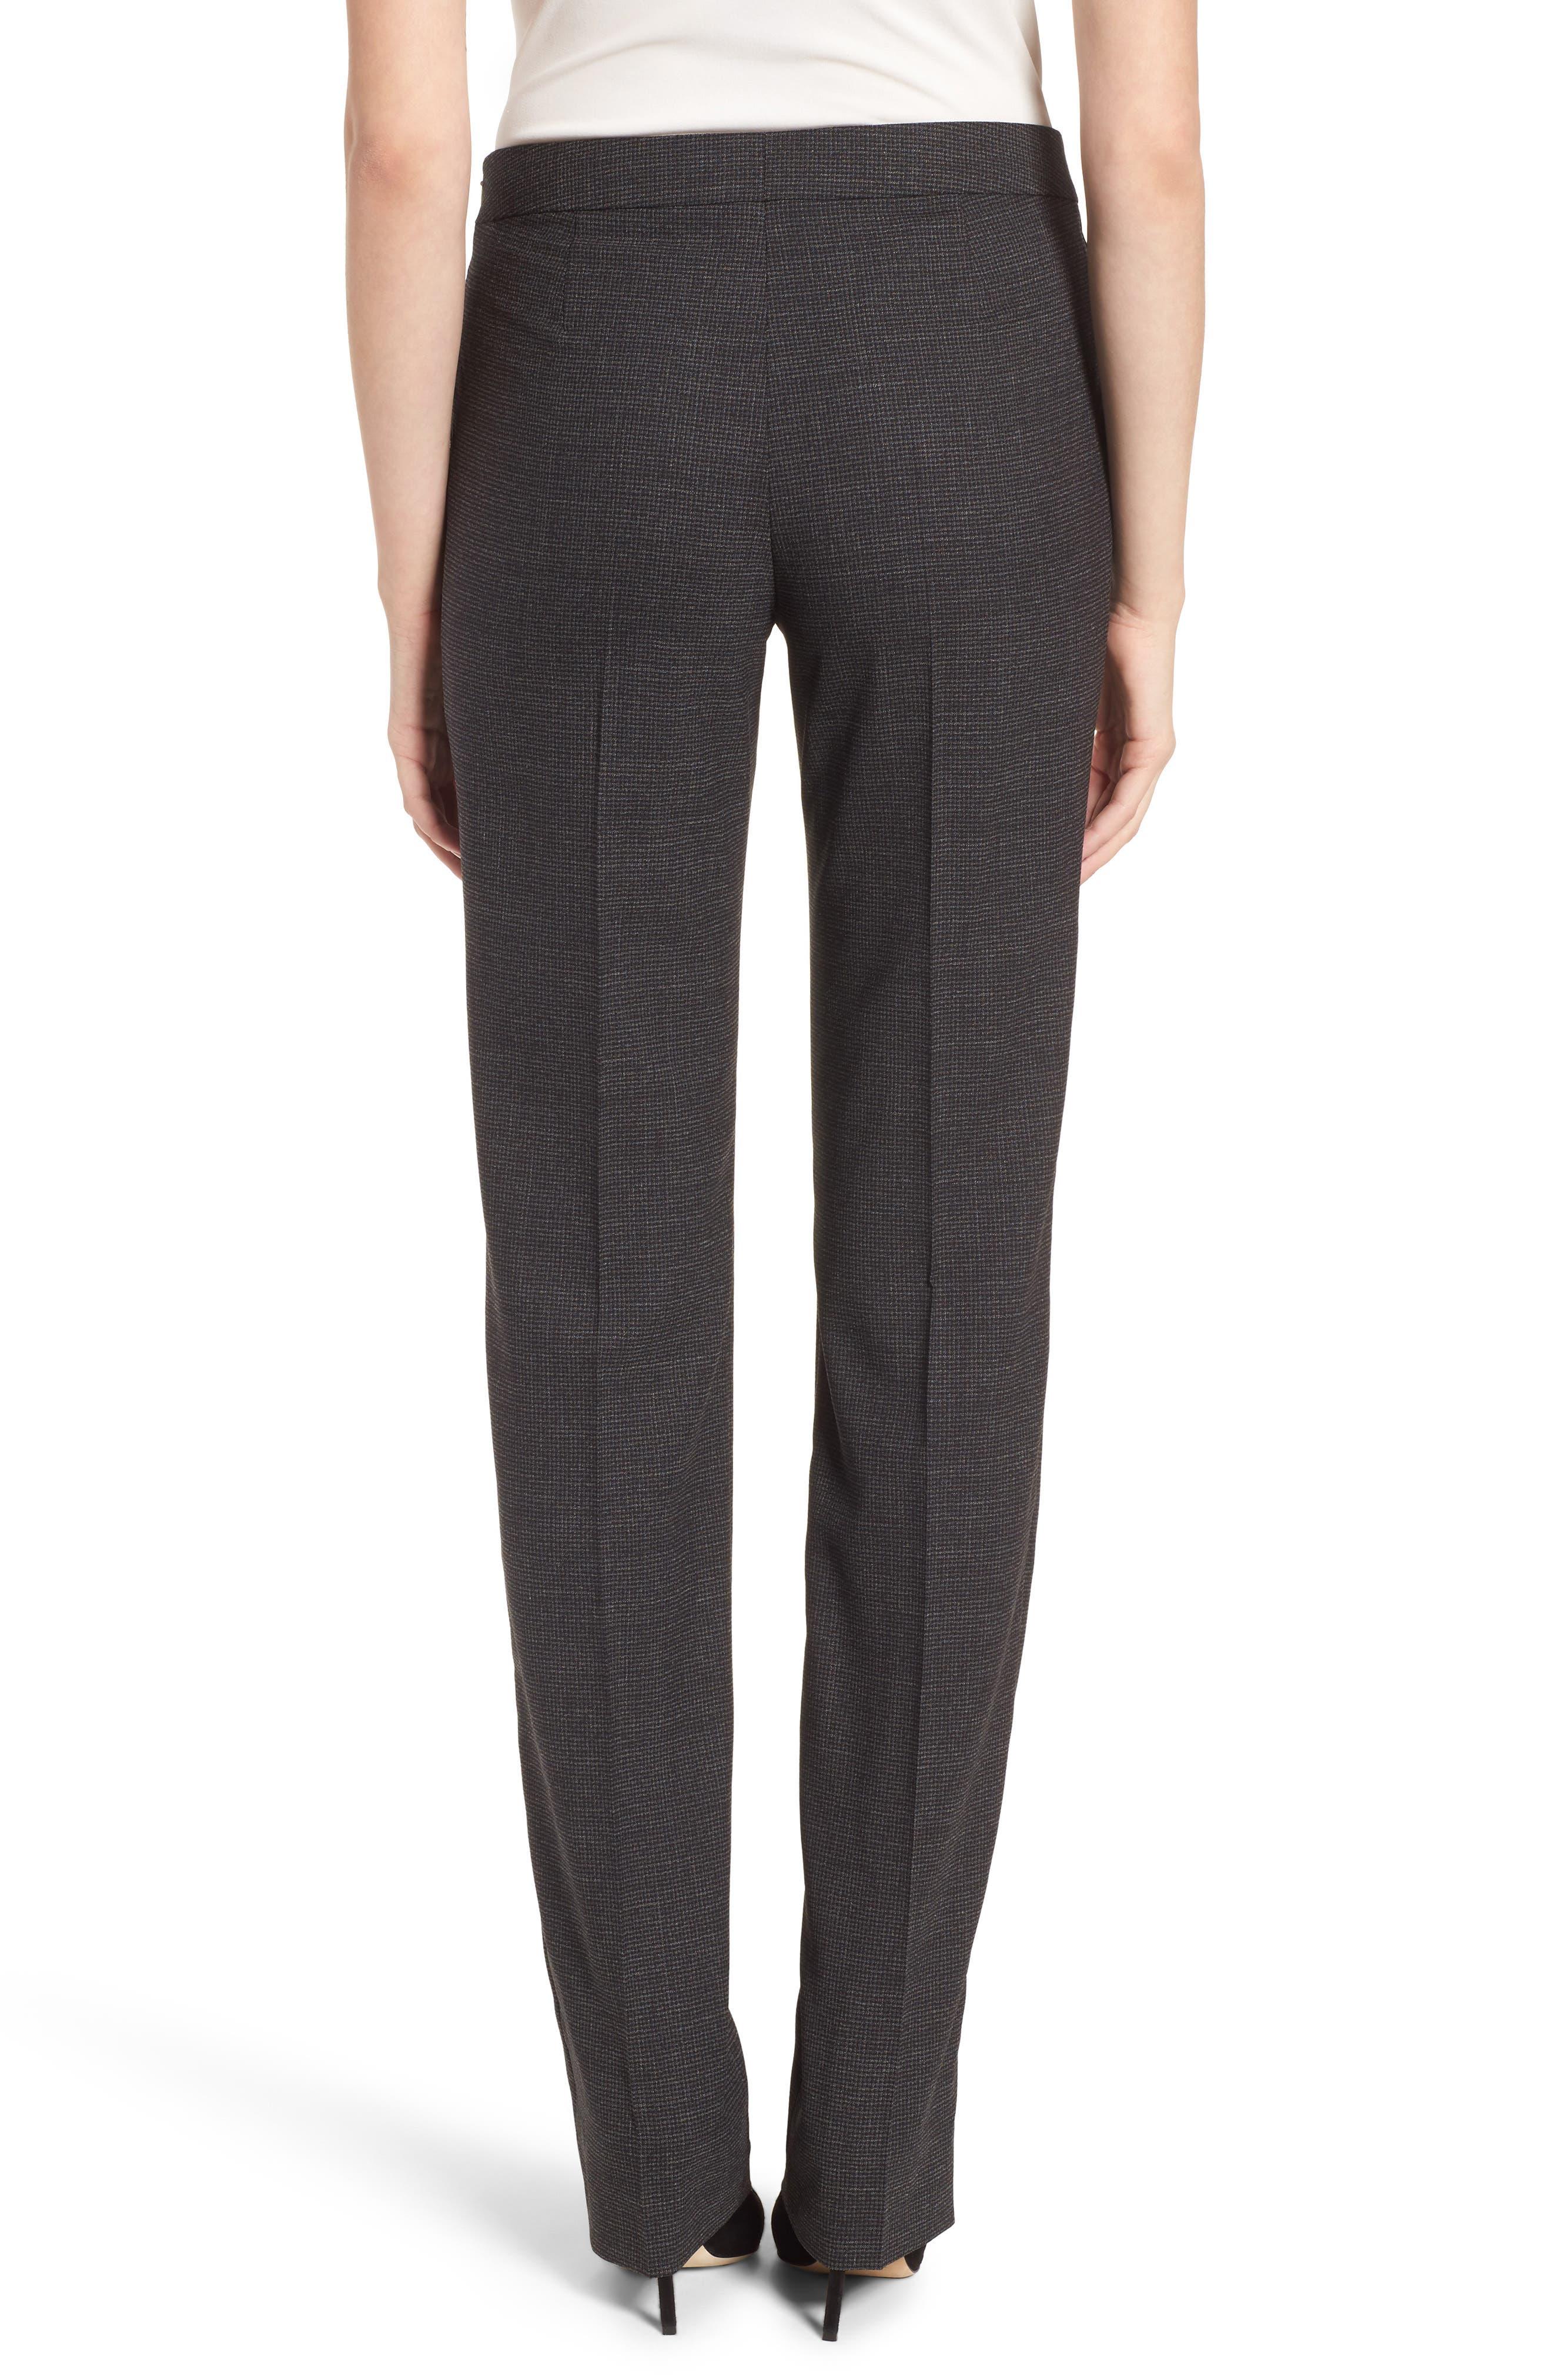 Tafena Check Stretch Wool Pants,                             Alternate thumbnail 2, color,                             006